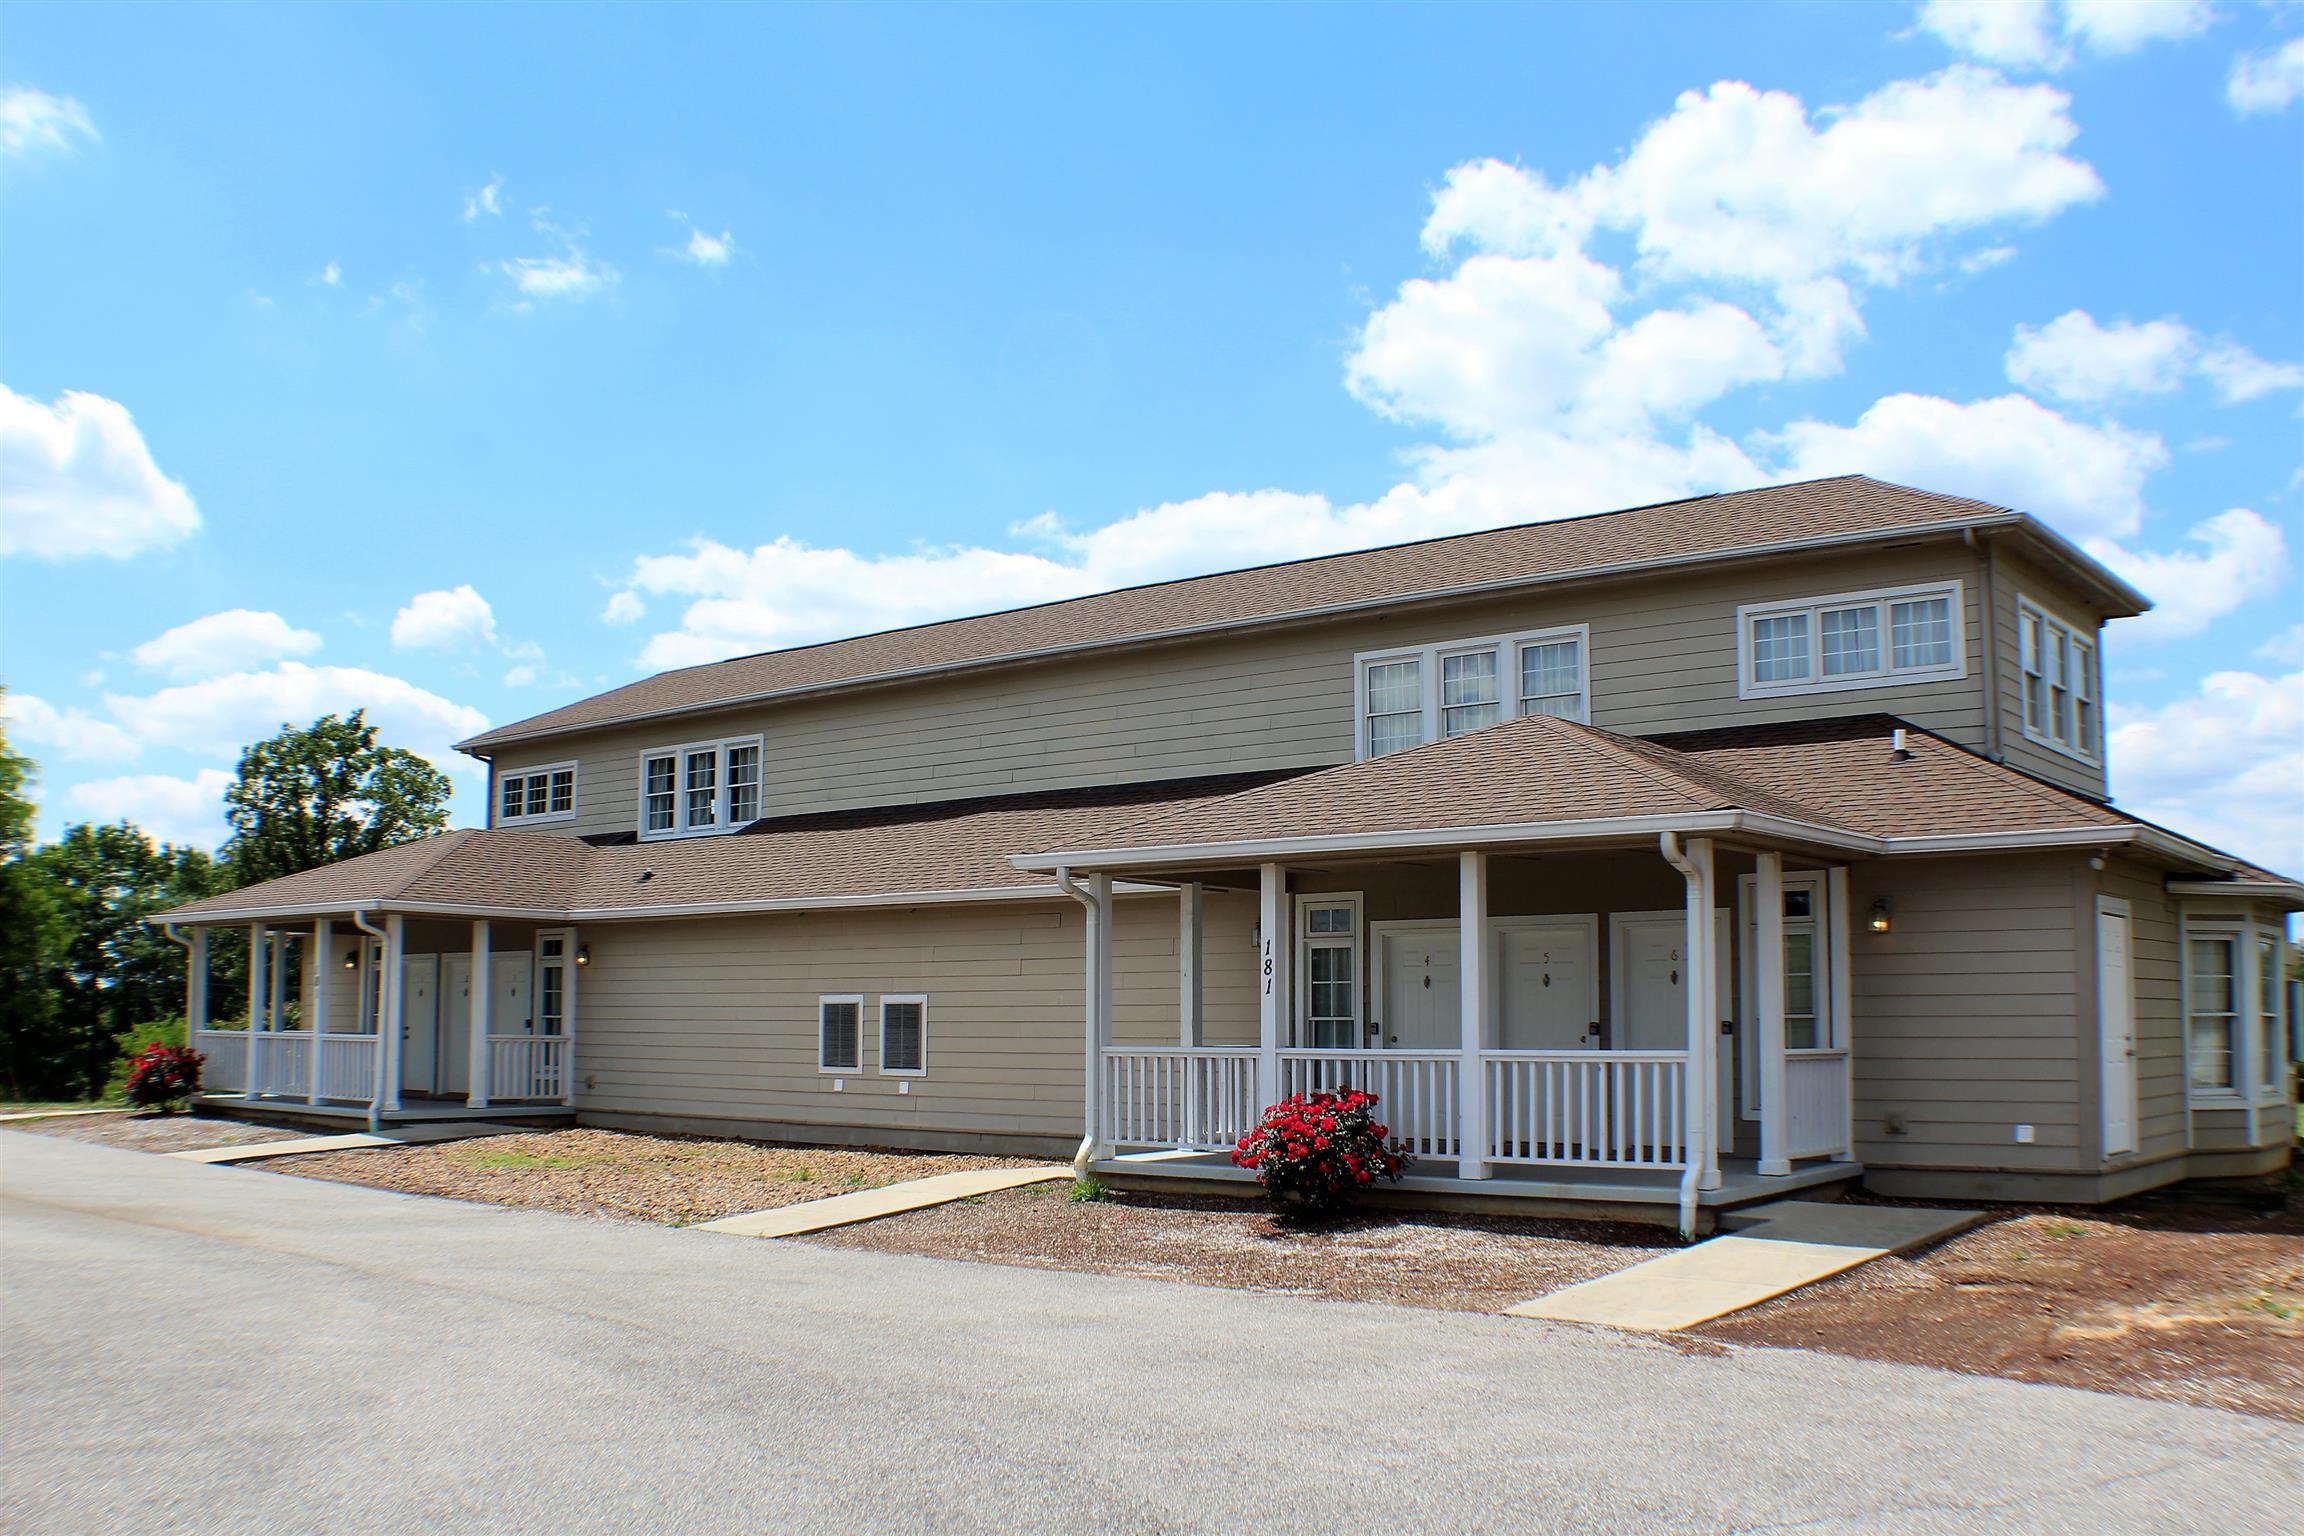 181 Hopper Ridge Rd, Sparta, TN 38583 - Sparta, TN real estate listing